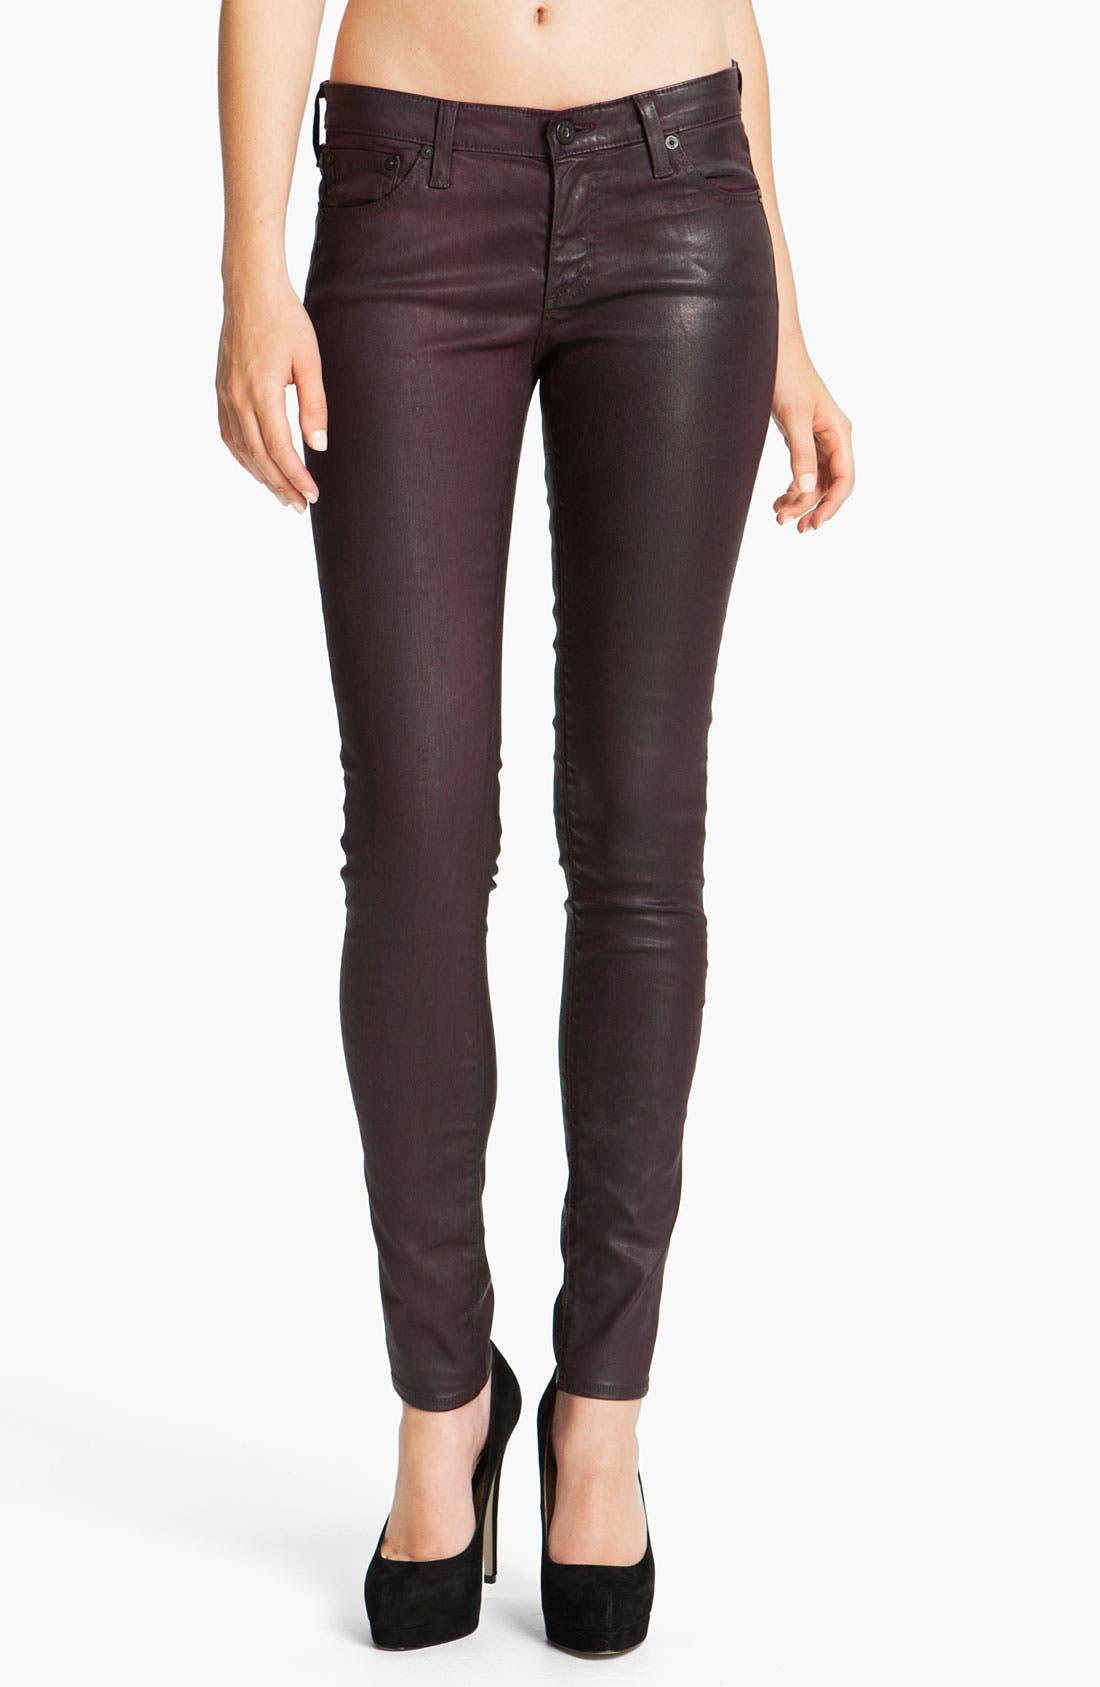 Alternate Image 1 Selected - AG Jeans Coated Skinny Jeans (Blackberry)